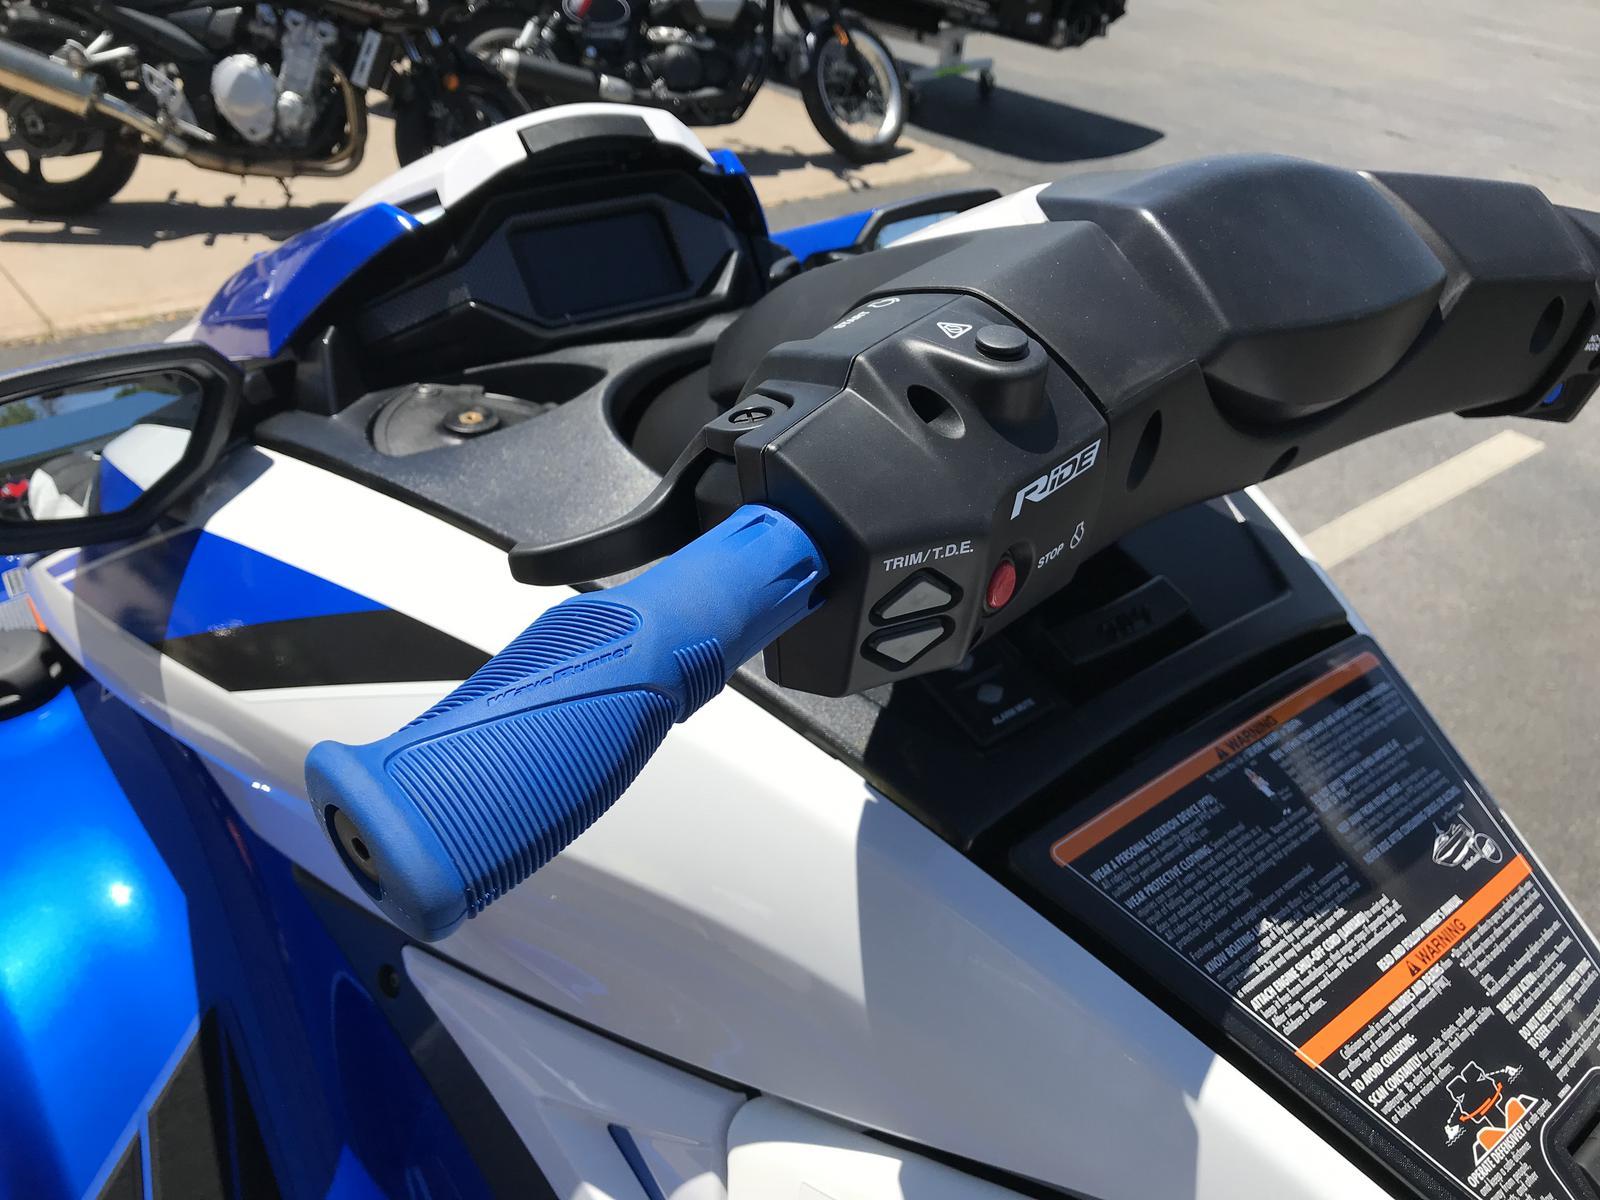 2019 Yamaha FX Cruiser SVHO (Azure Blue Metallic/Pure White)